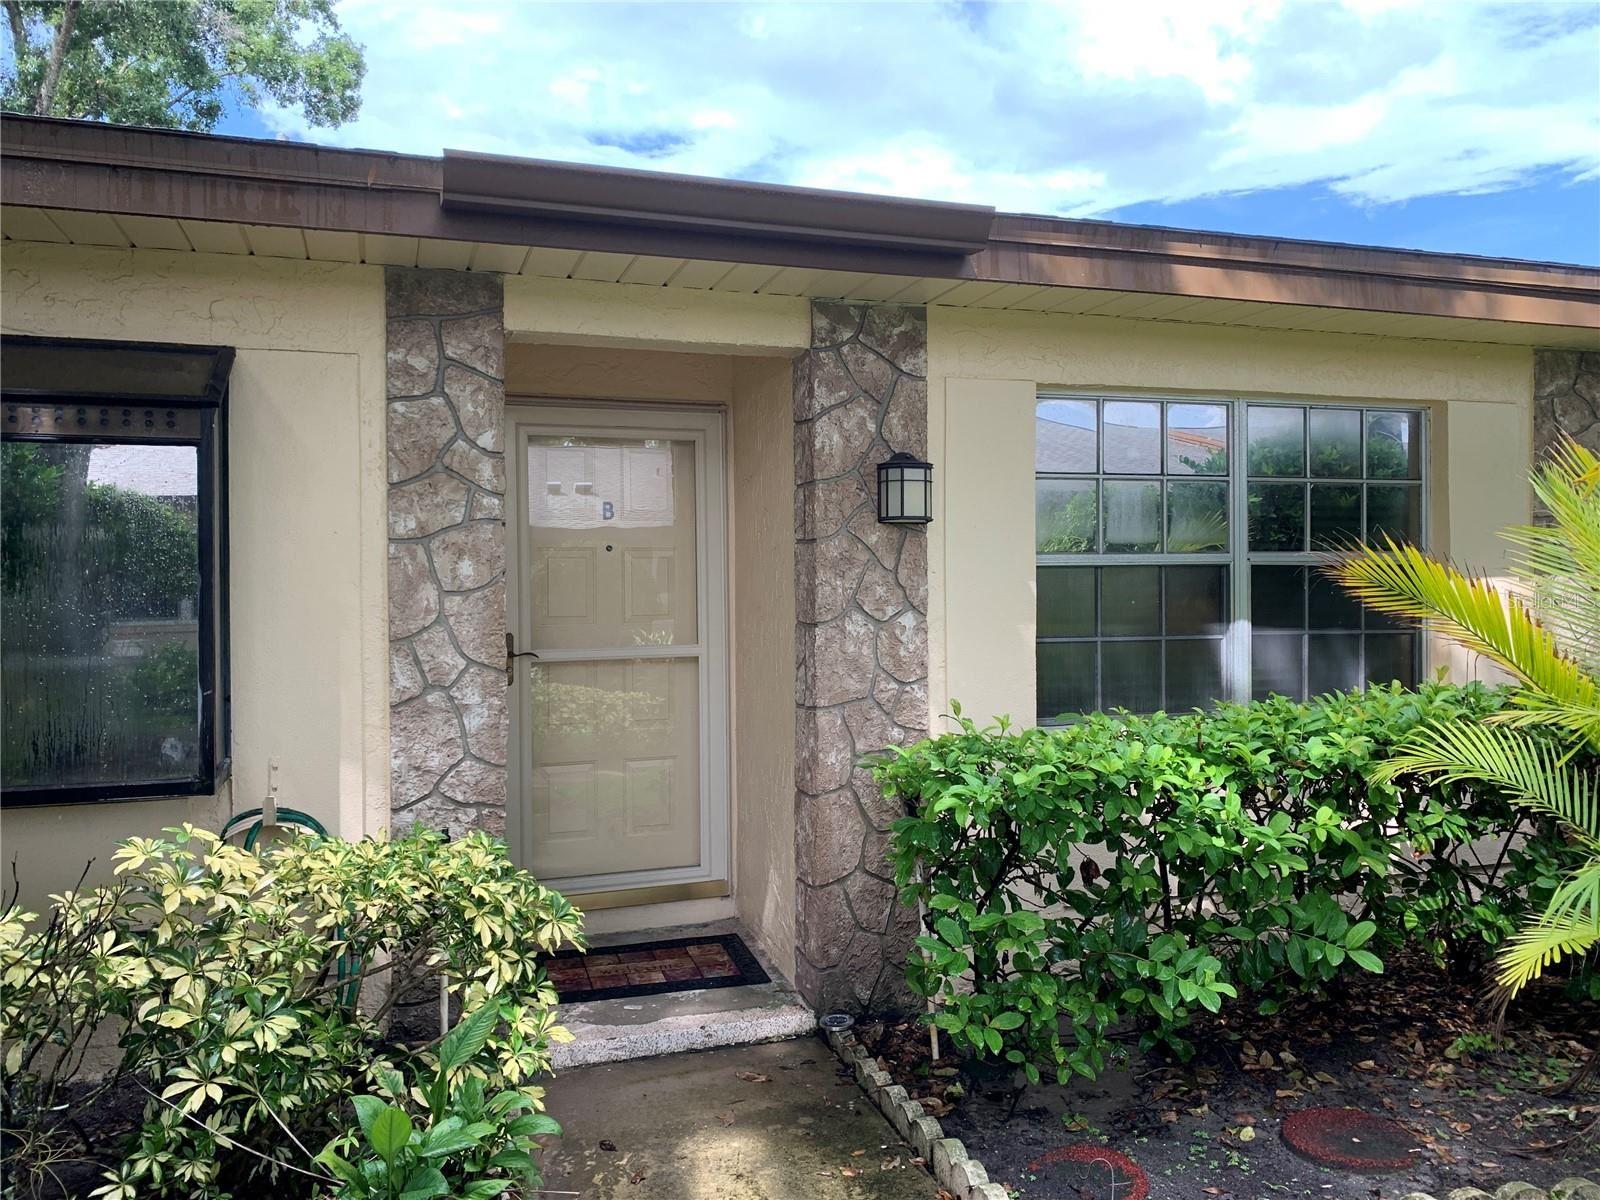 865 MACLAREN DRIVE N #B, Palm Harbor, FL 34684 - #: U8136071